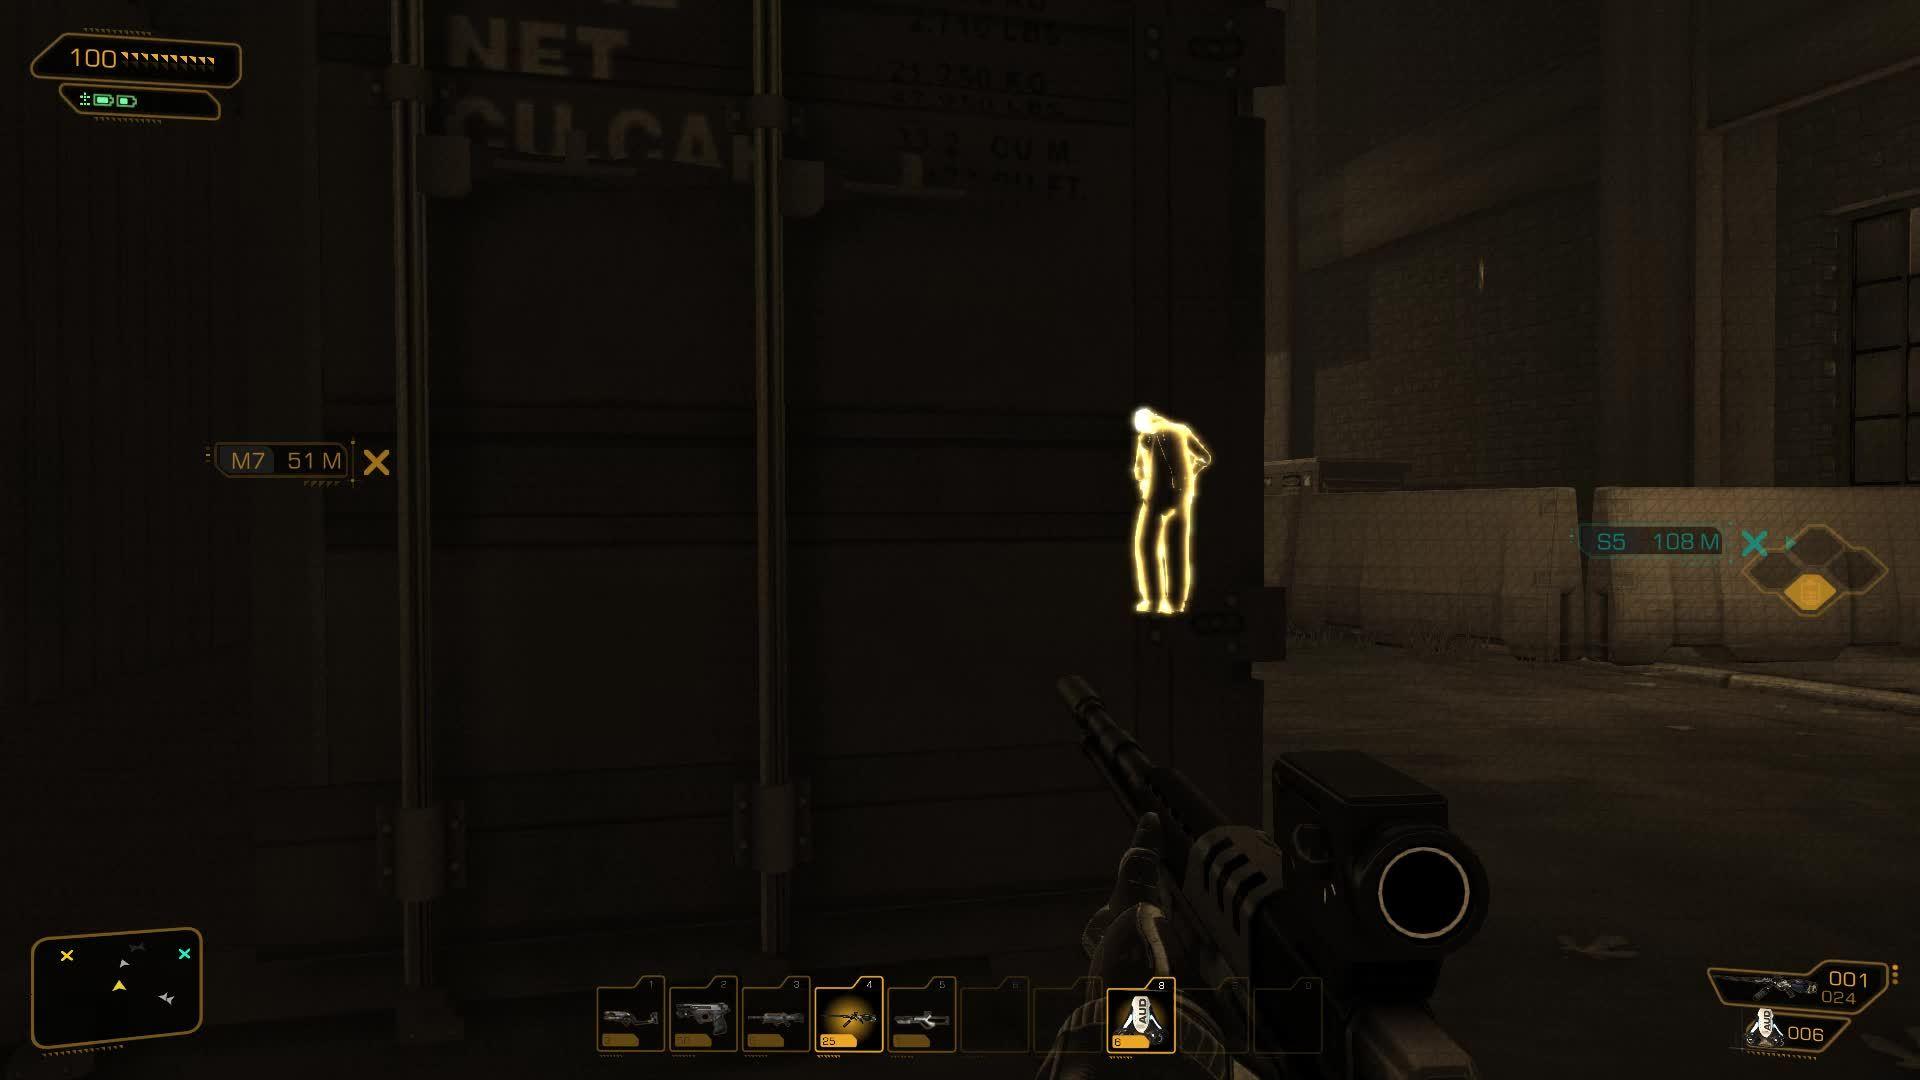 GamePhysics, Deus Ex Human Revolution Tranquilizer Dart GIFs